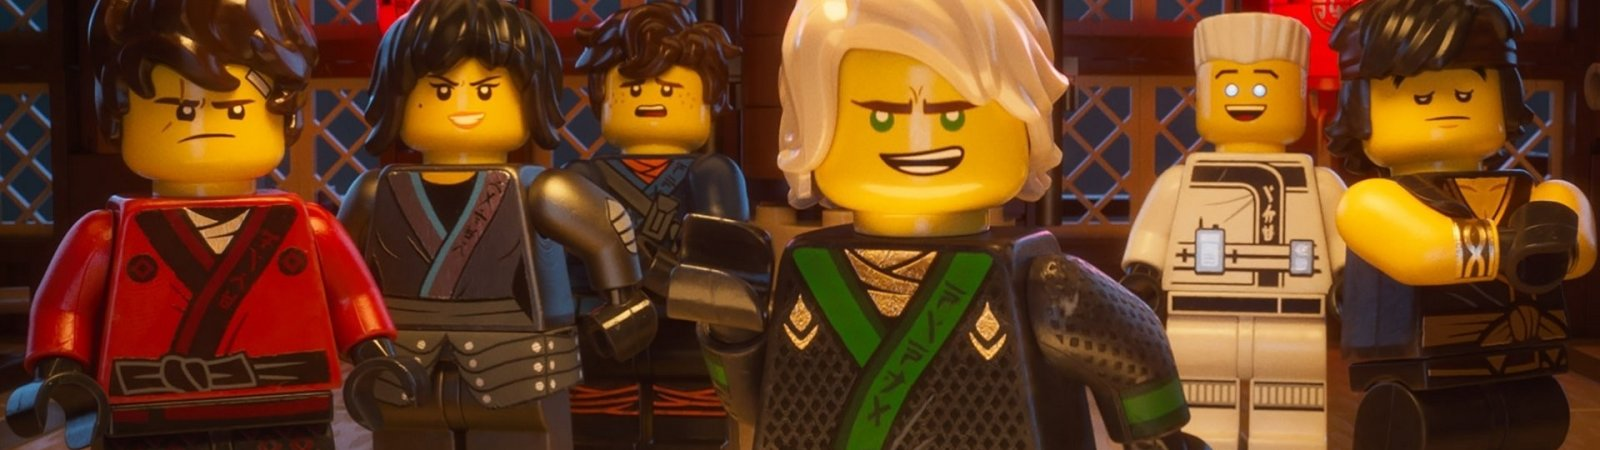 Photo du film : Lego Ninjago : le film